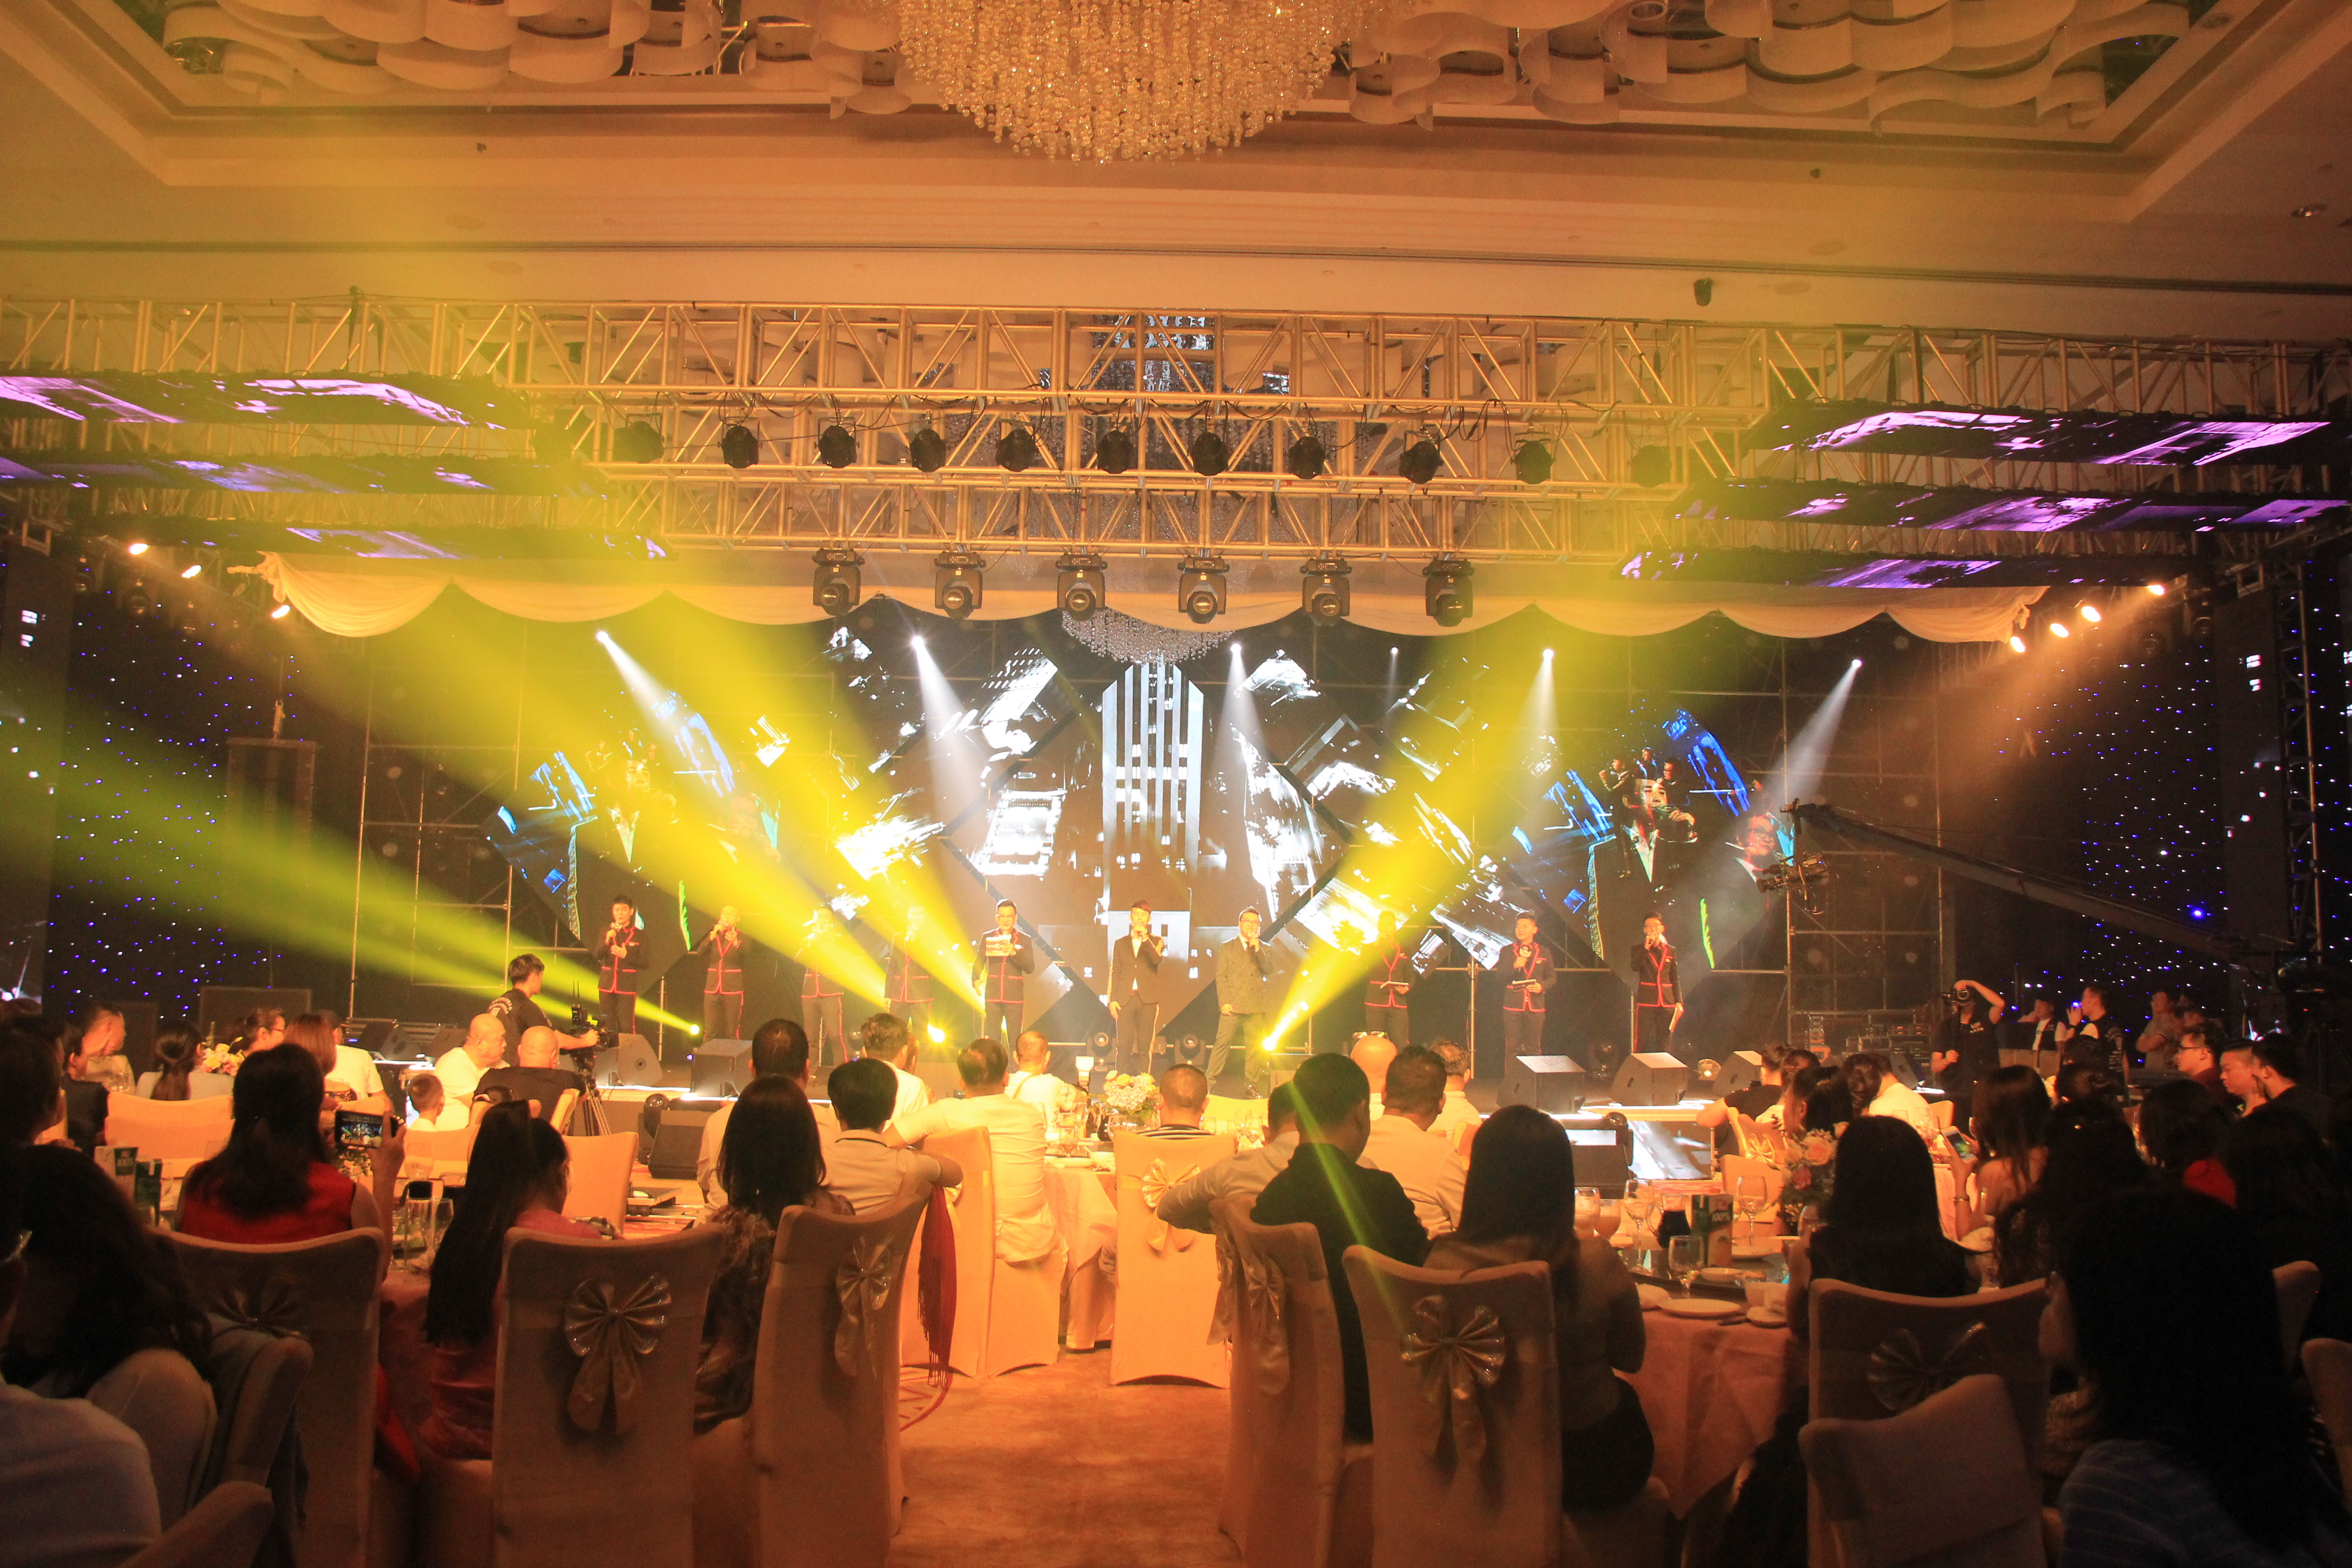 <b>音你而来——香港凯歌传媒十周年感恩盛典为美发声!</b>